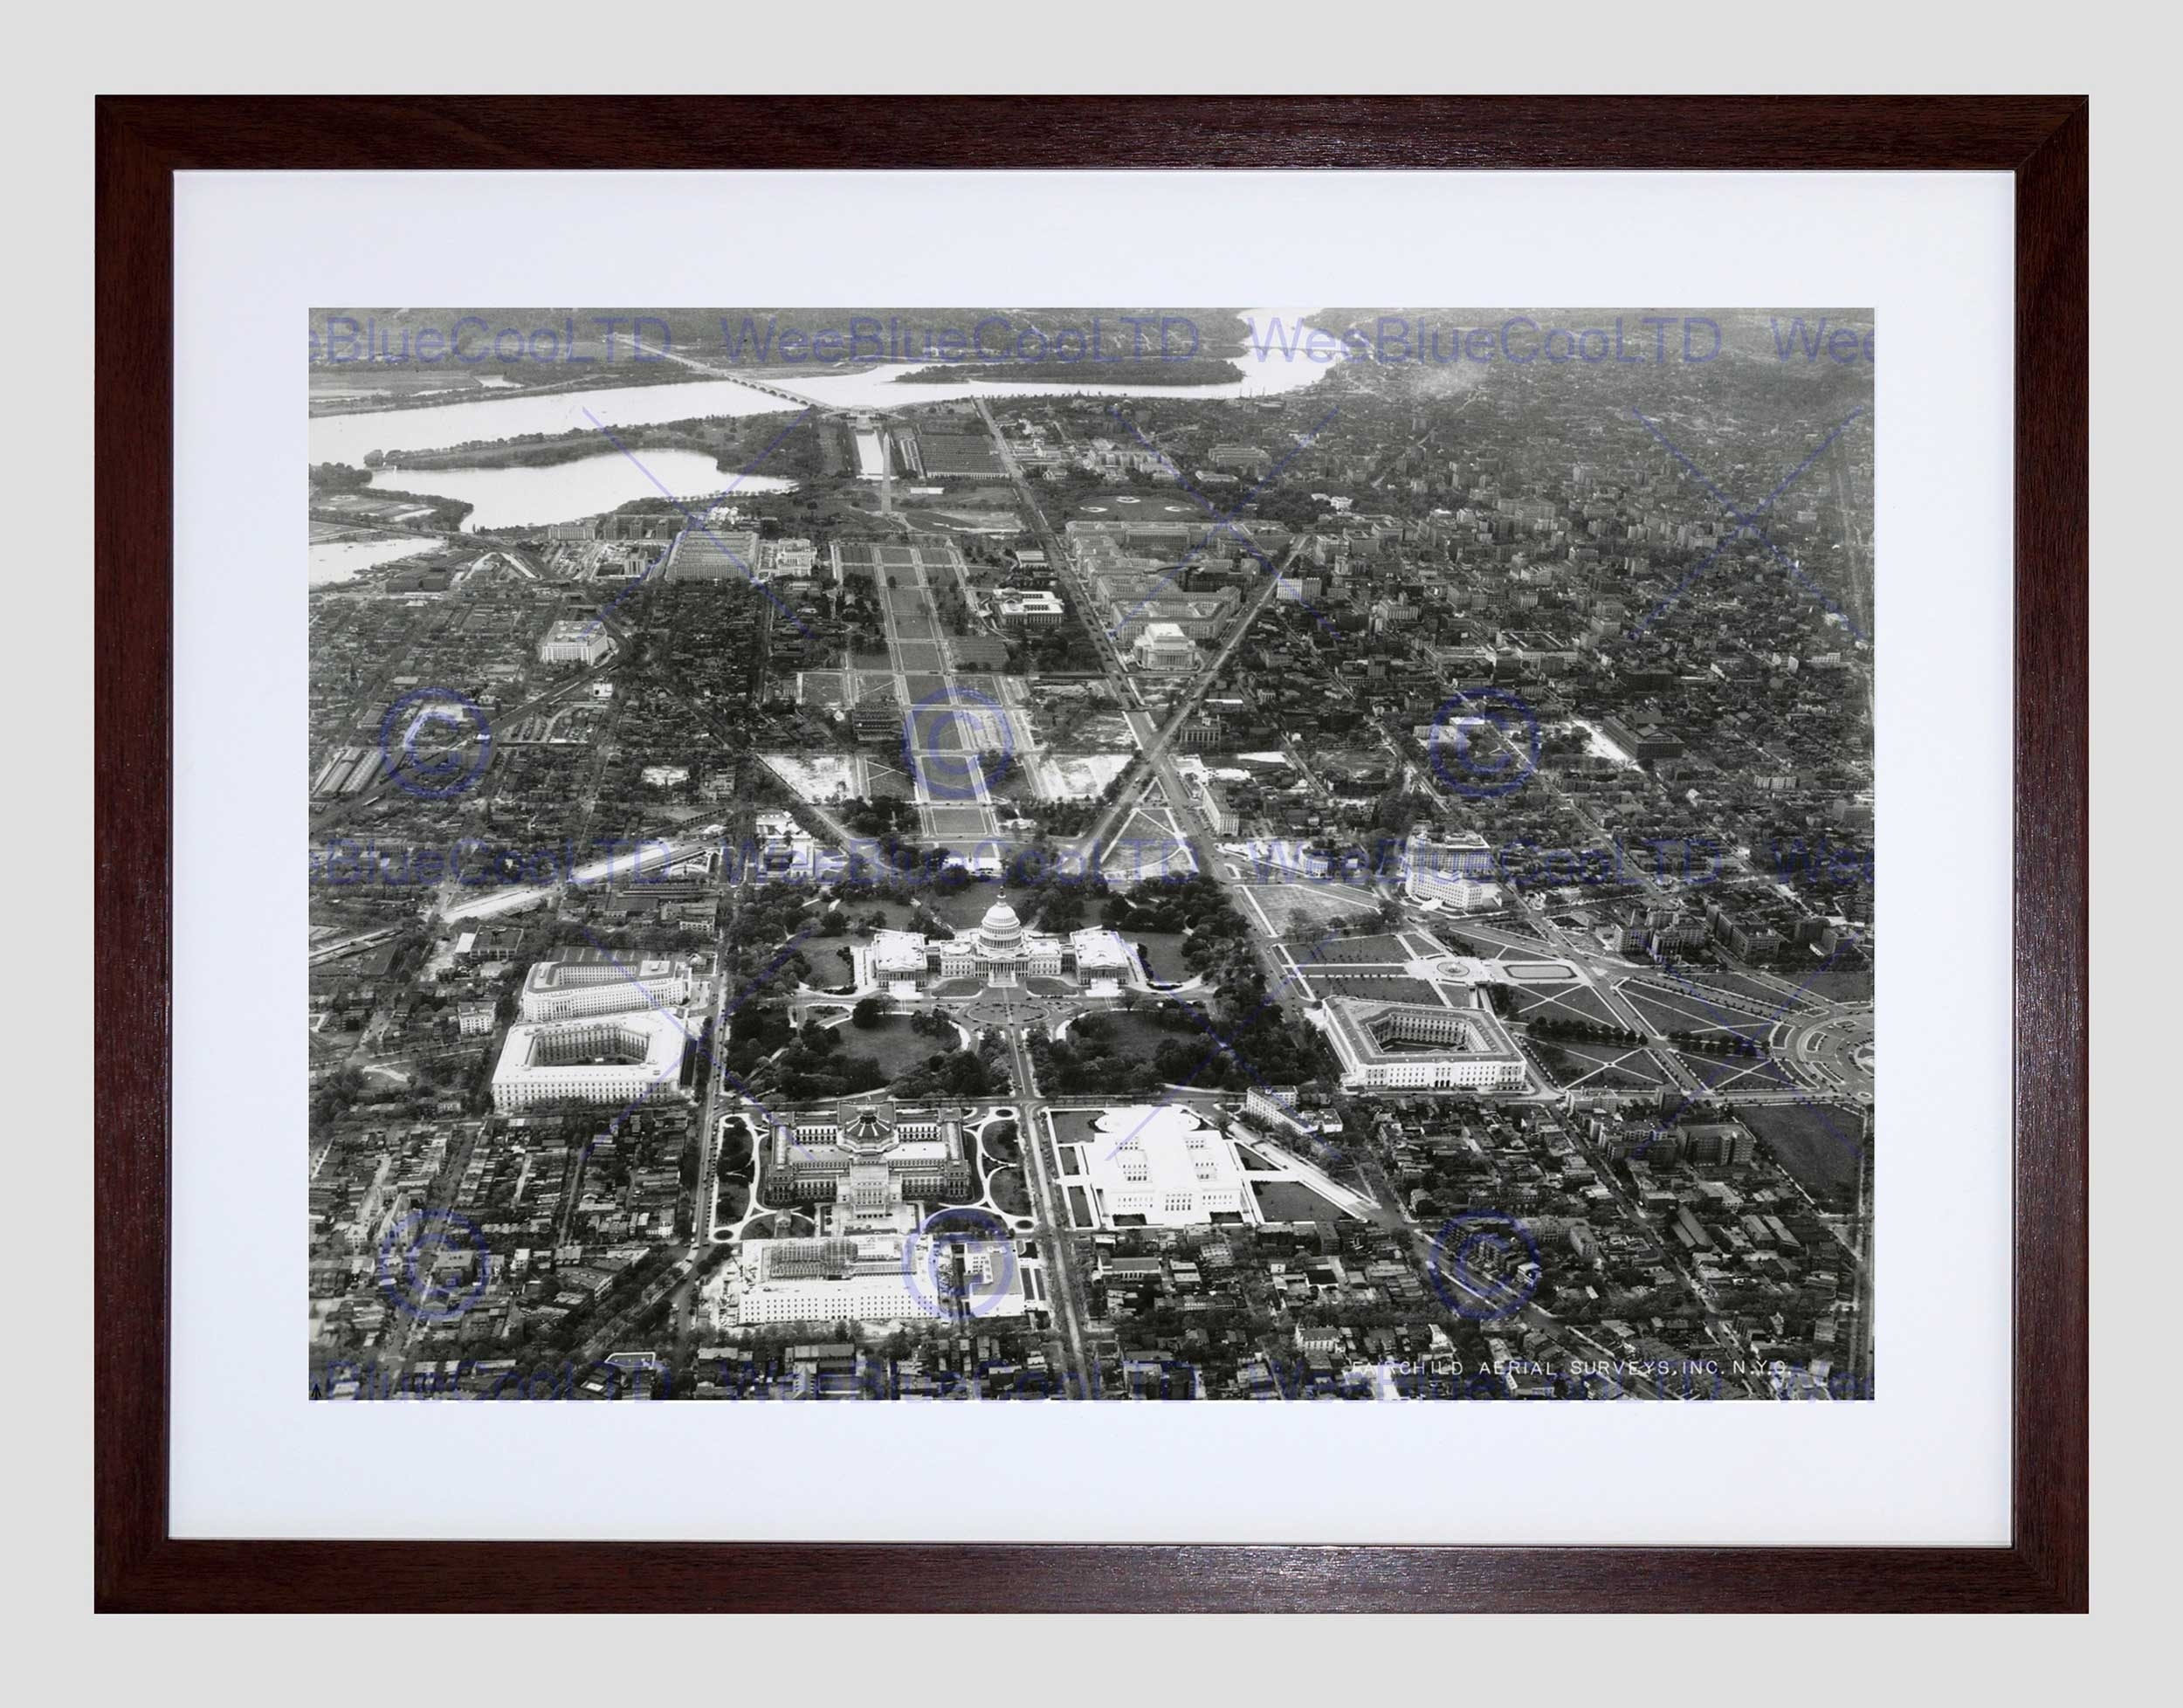 Vintage Aerial Capitol Hill Washington Dc America Usa Framed Art In Current Washington Dc Framed Art Prints (View 3 of 15)